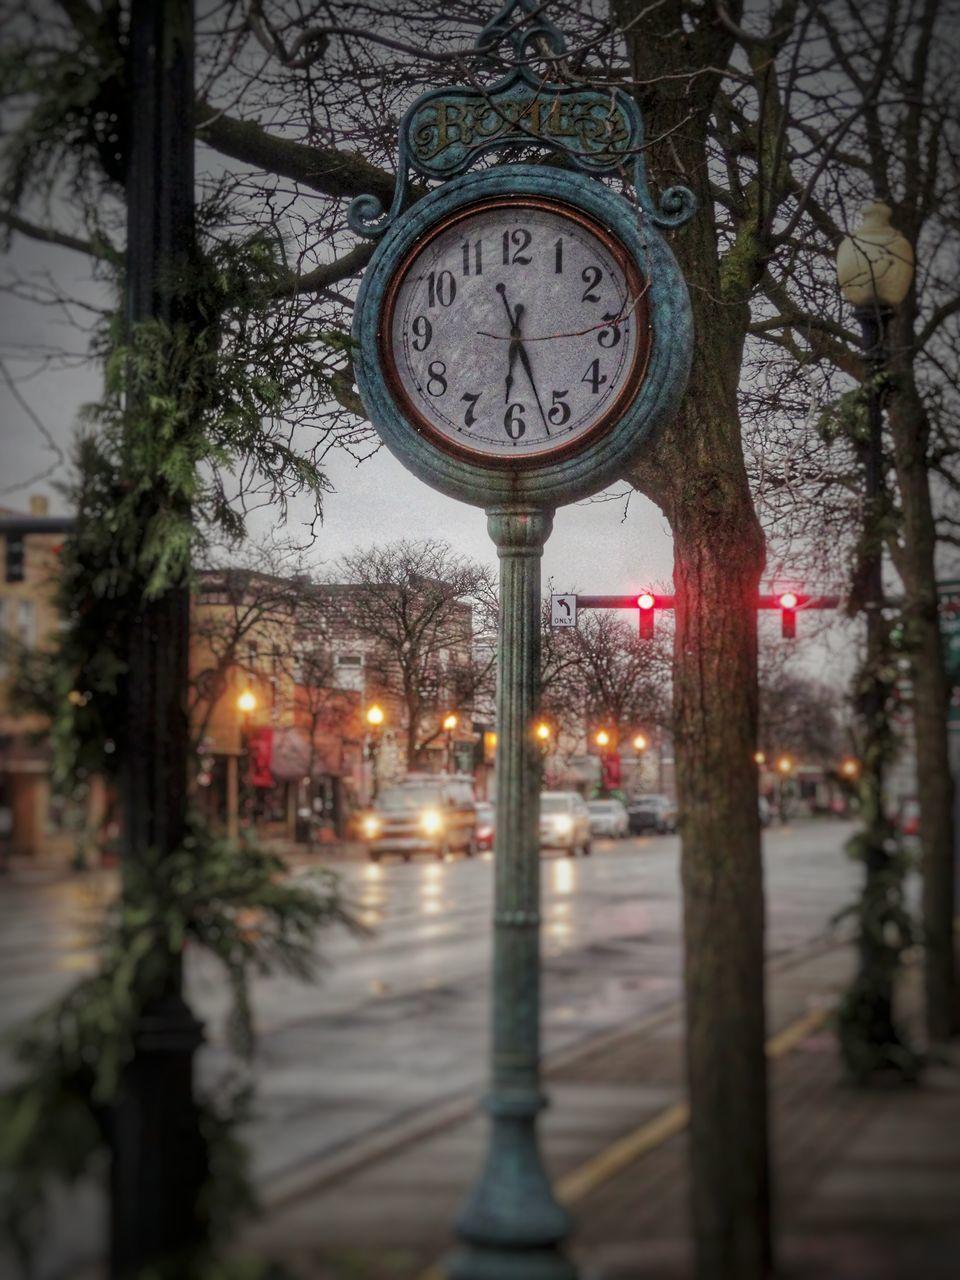 tree, clock, bare tree, time, winter, no people, outdoors, snow, night, nature, city, clock face, sky, close-up